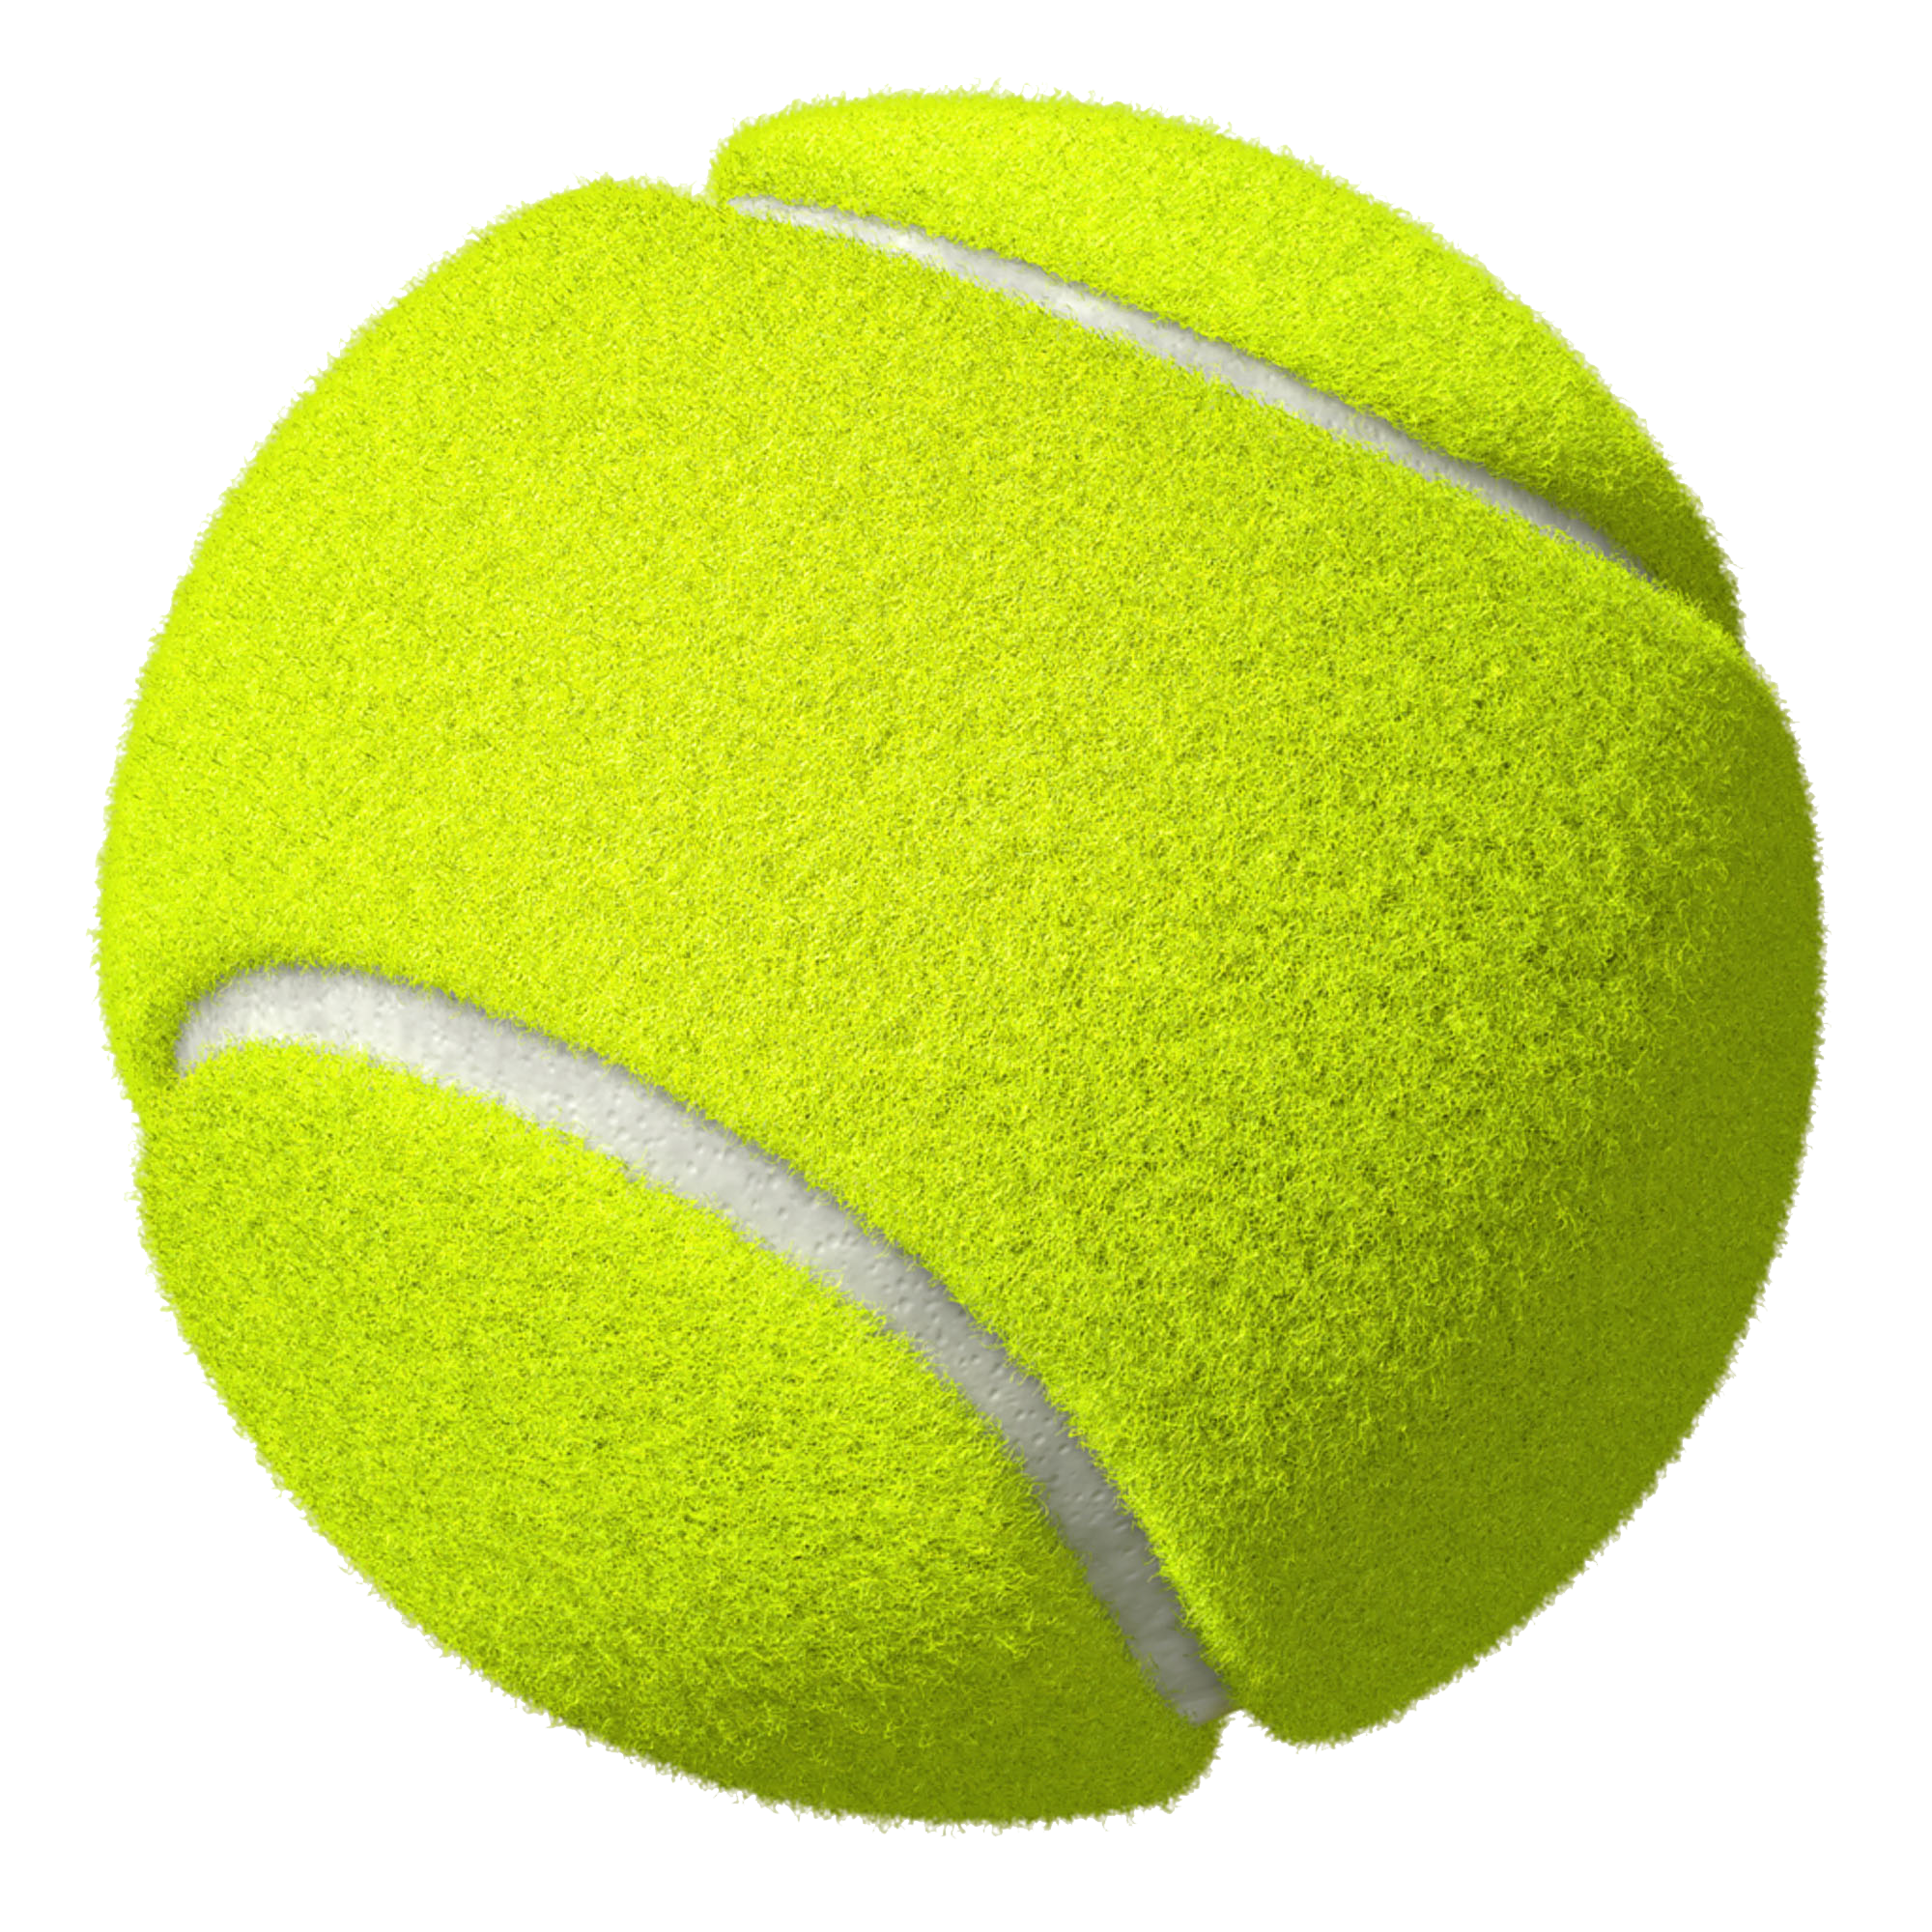 Tennis Ball Png Google Search Tennis Ball Tennis Tennis Balls